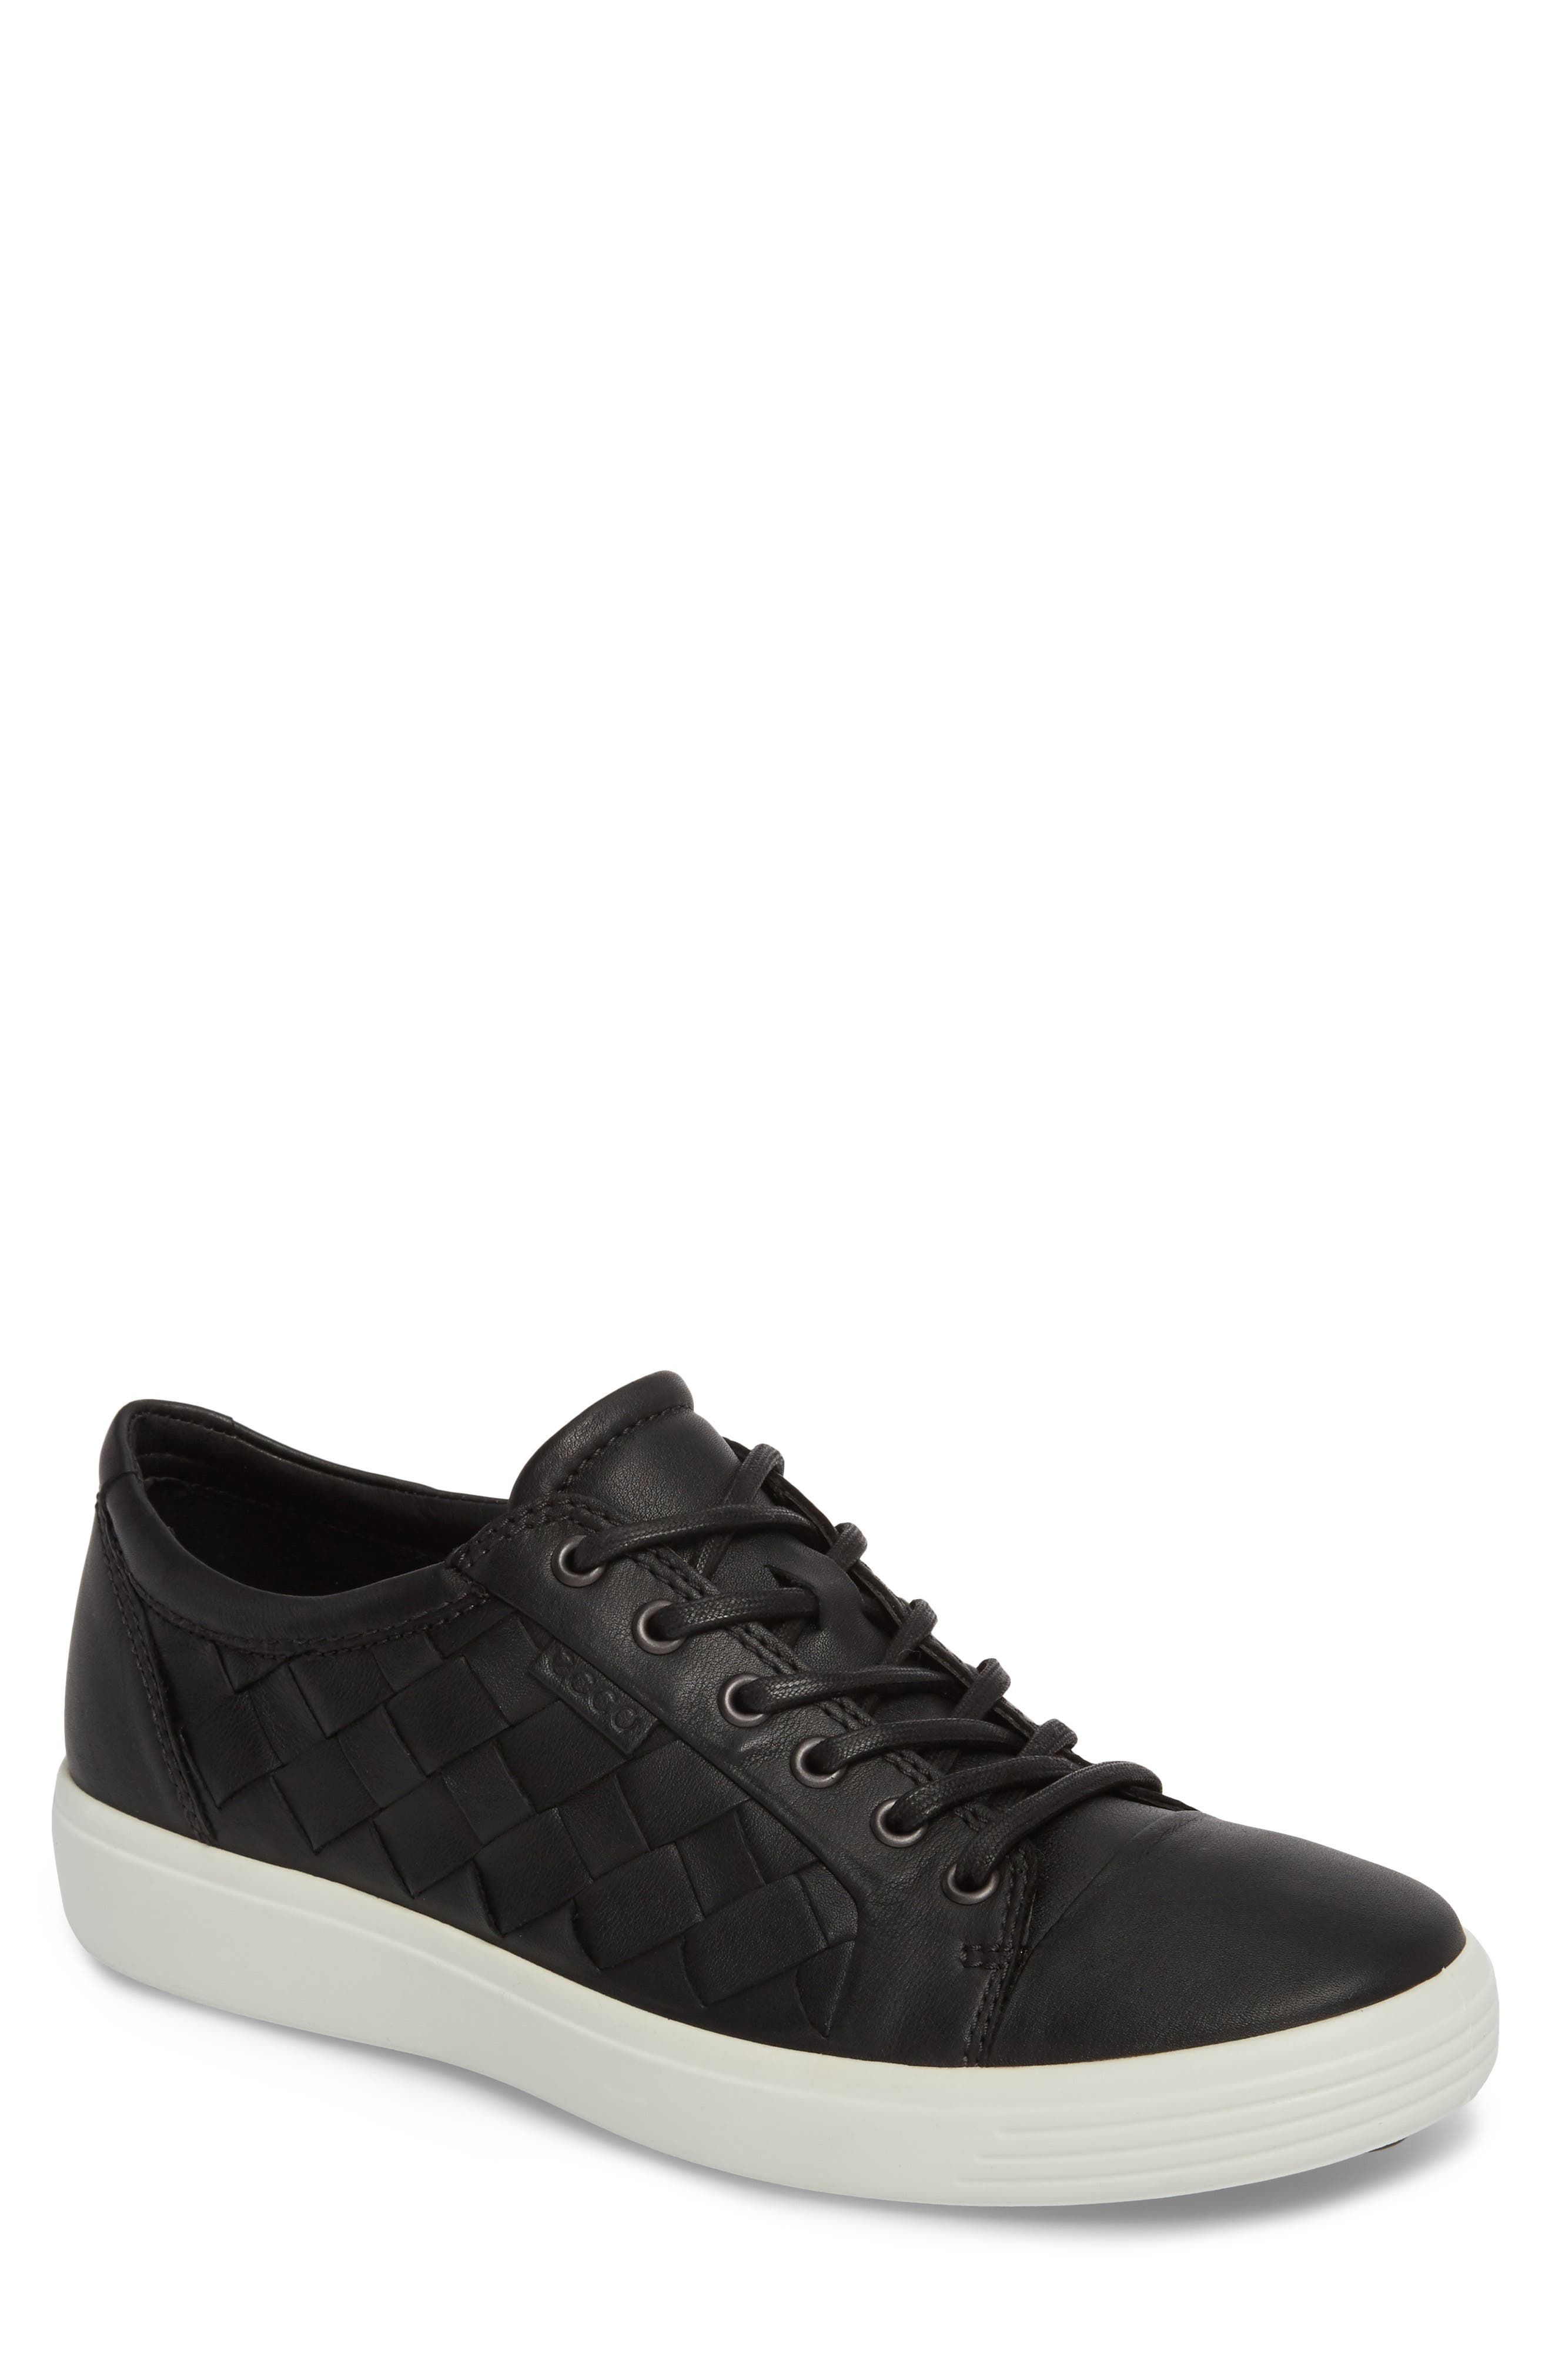 ECCO, Soft 7 Woven Sneaker, Main thumbnail 1, color, 009